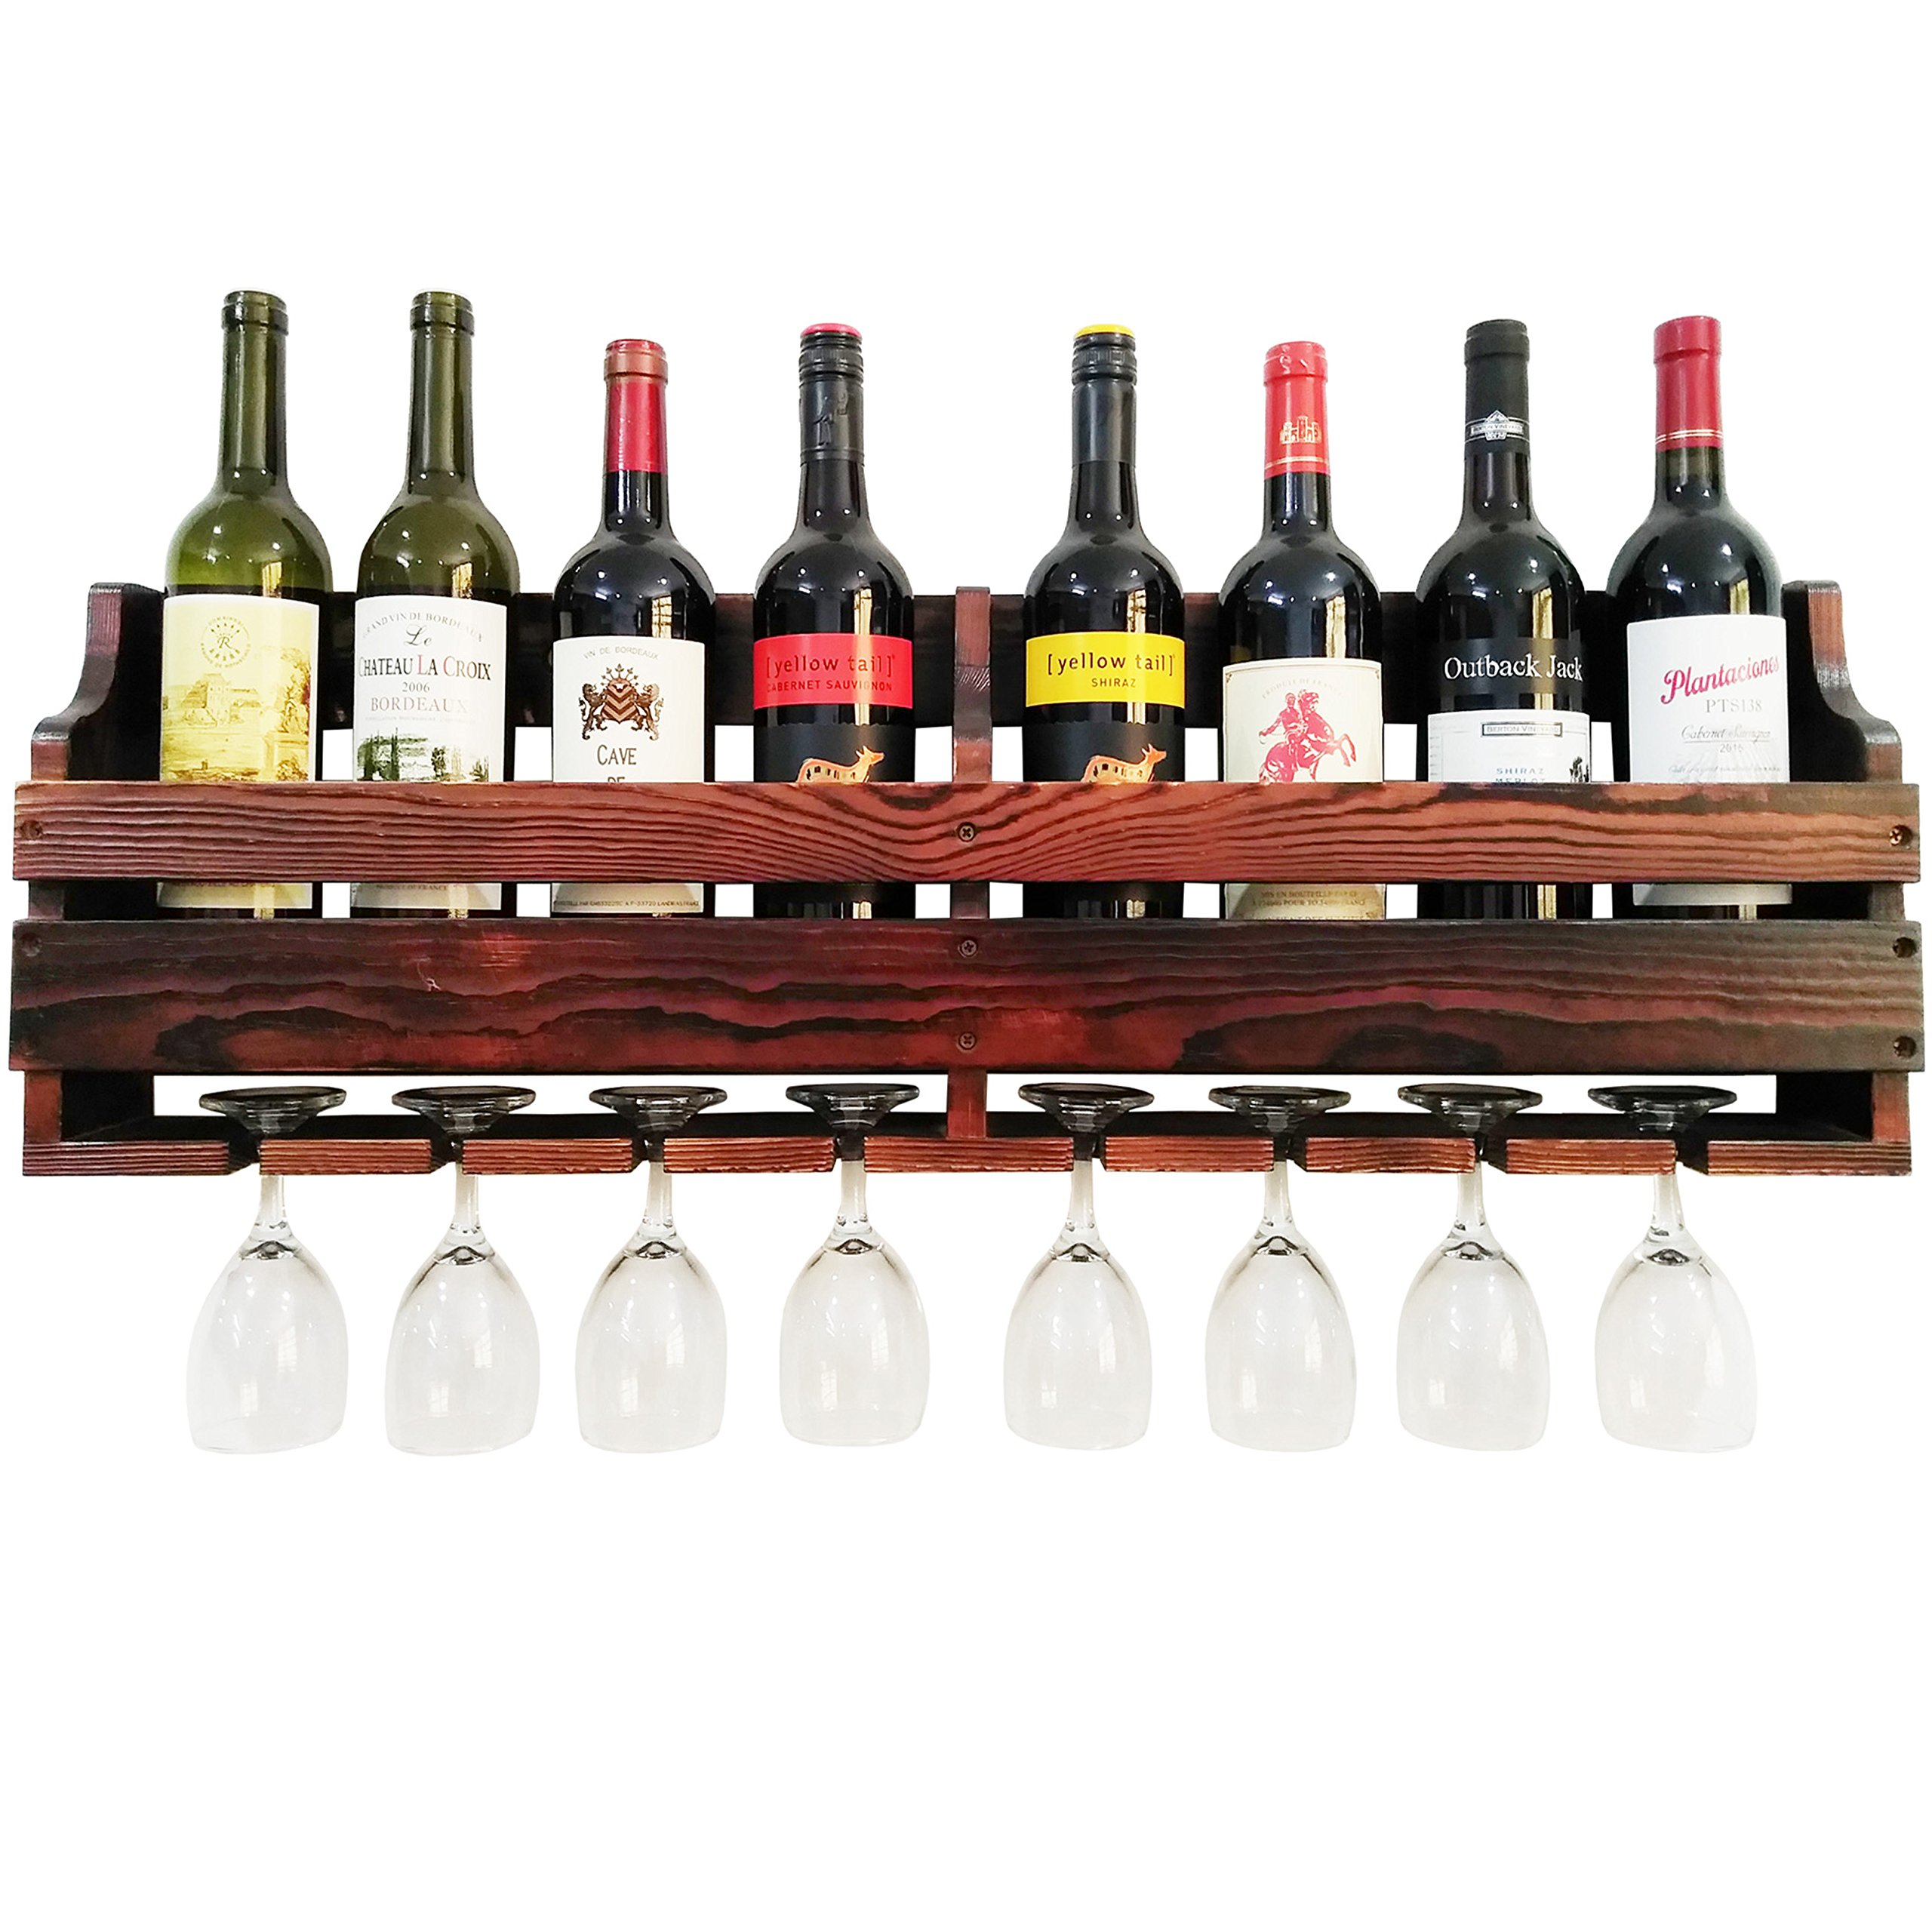 TUORUI Wine Rack Wall Mounted,Wine Glass & Wine Bottle Display Rack,pine wood,8 Bottle 8 Long Stem Glass Holder(Charcoal walnut color) by TUORUI